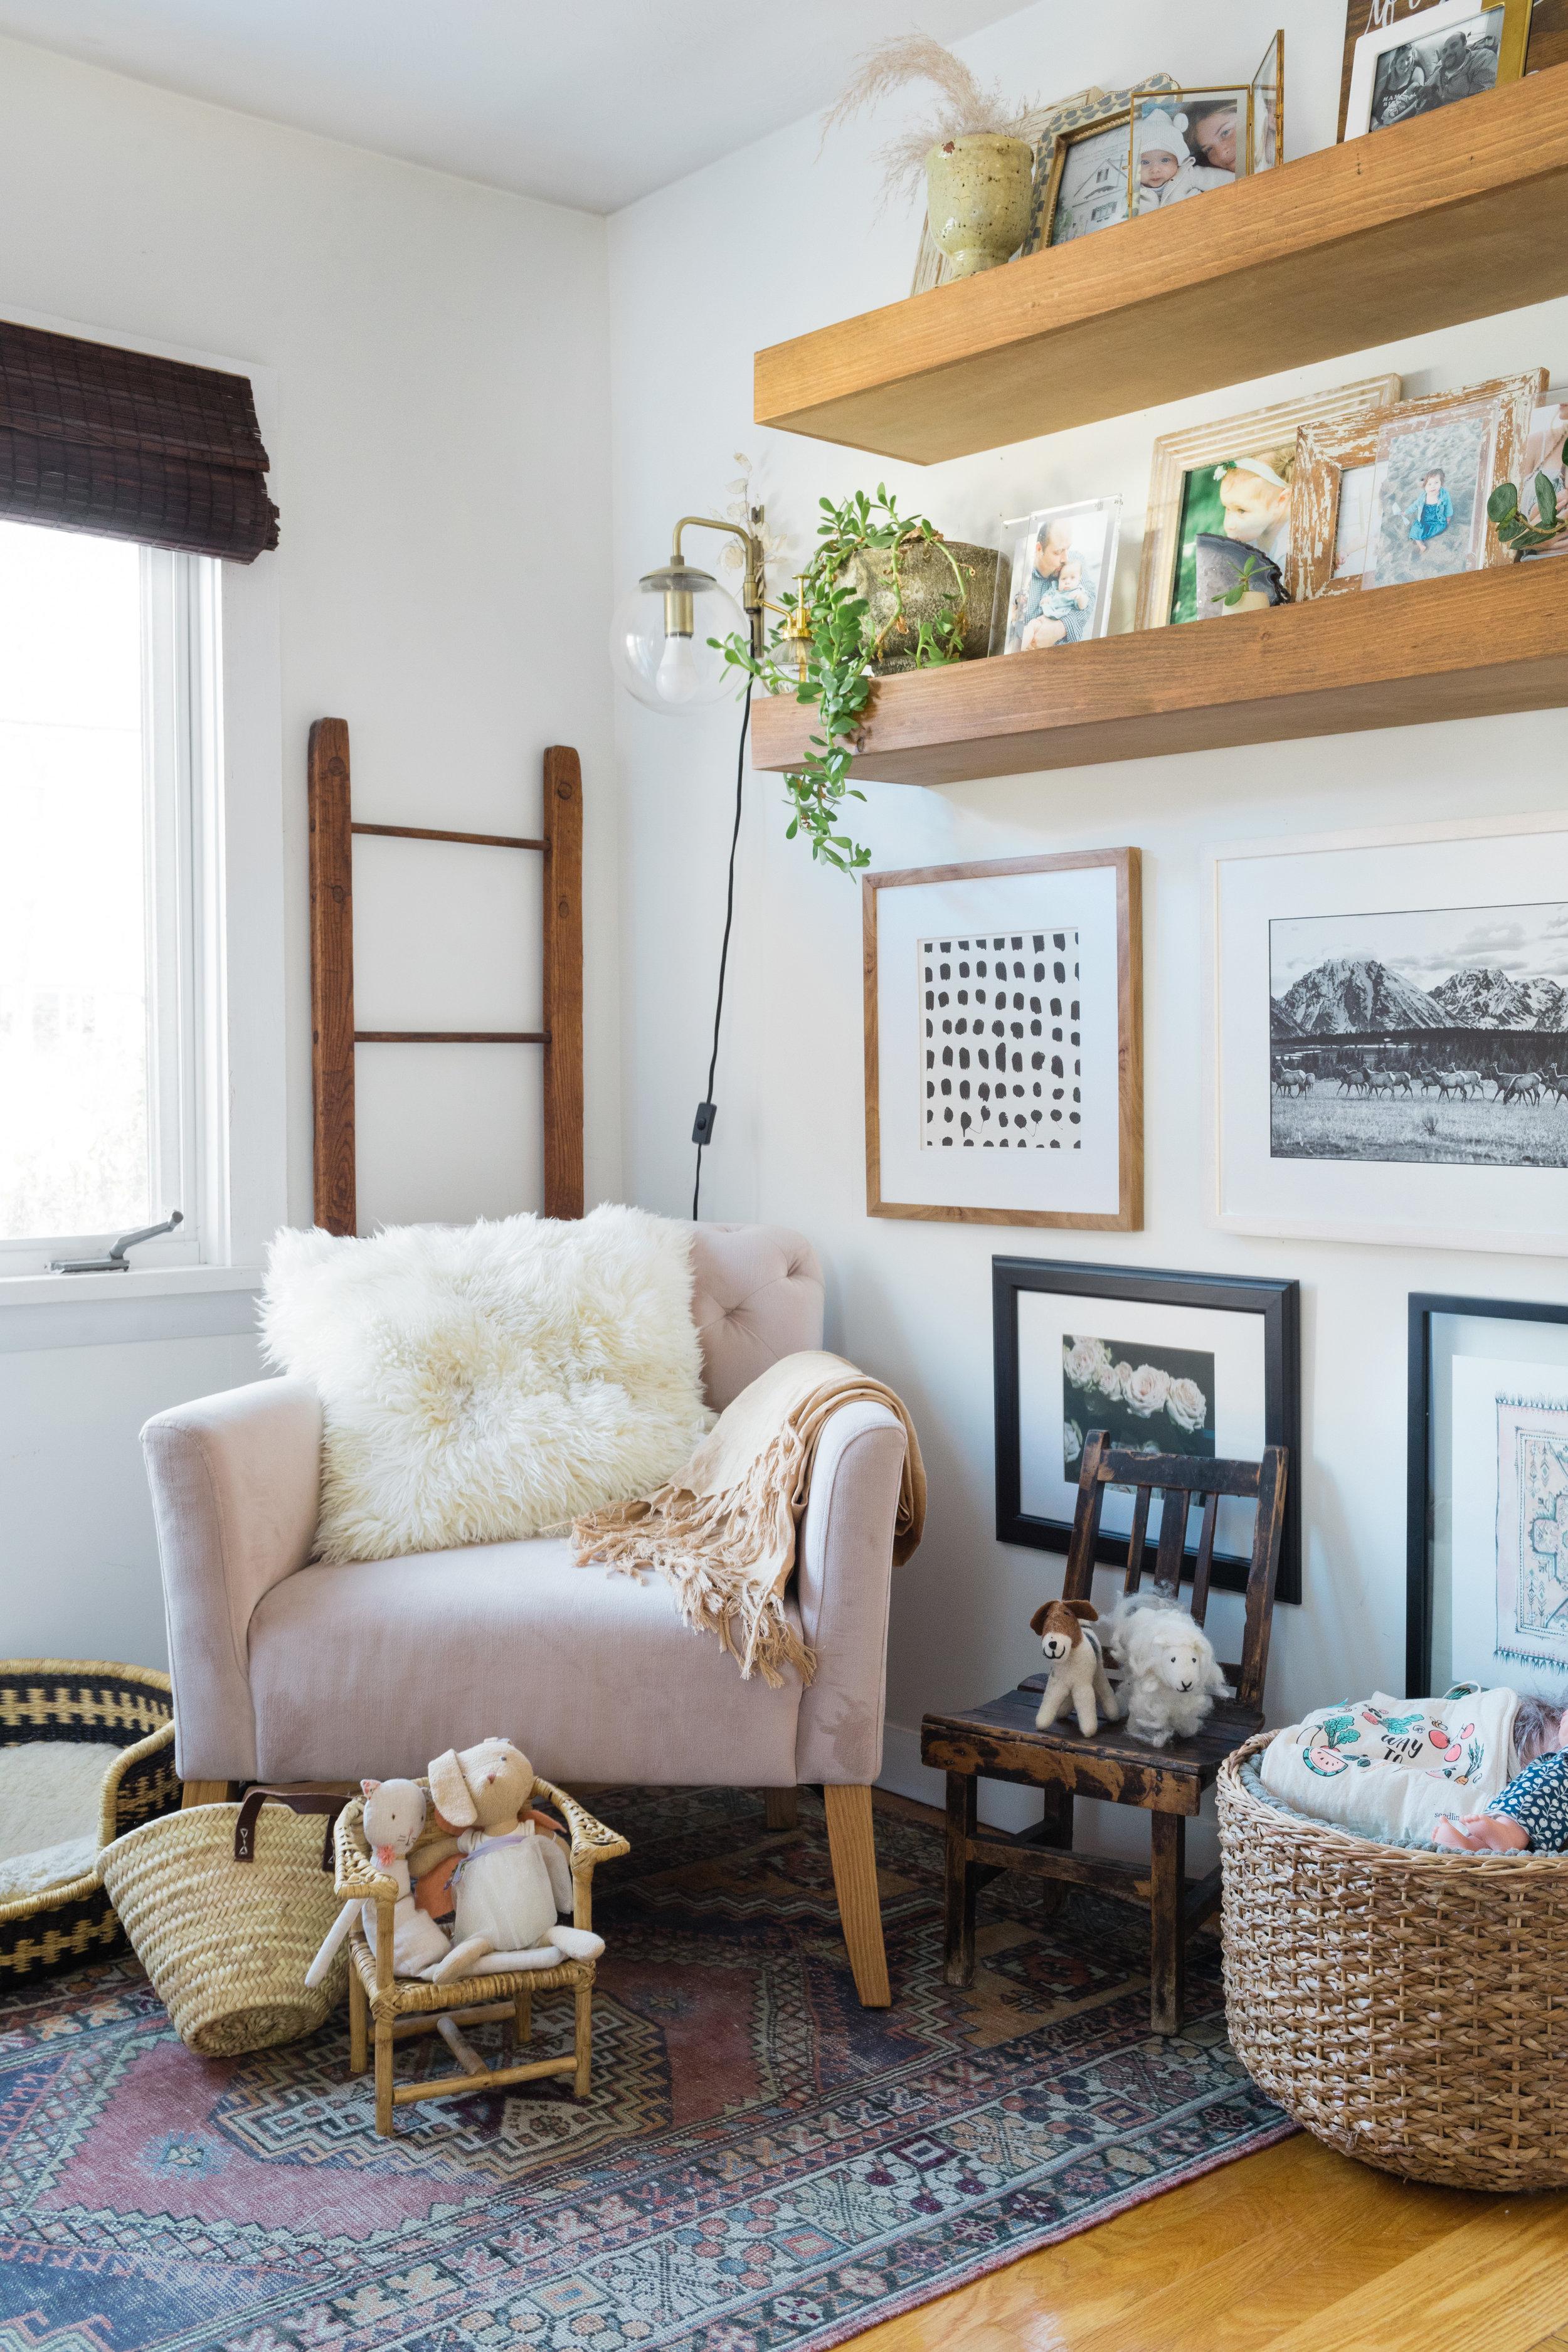 chair  /  shelves  / rug { similar } /  basket  / children's chair { similar } / vintage ladder { similar } /  sconce  /  bunny  / mini french market bag { similar } /  dog bed